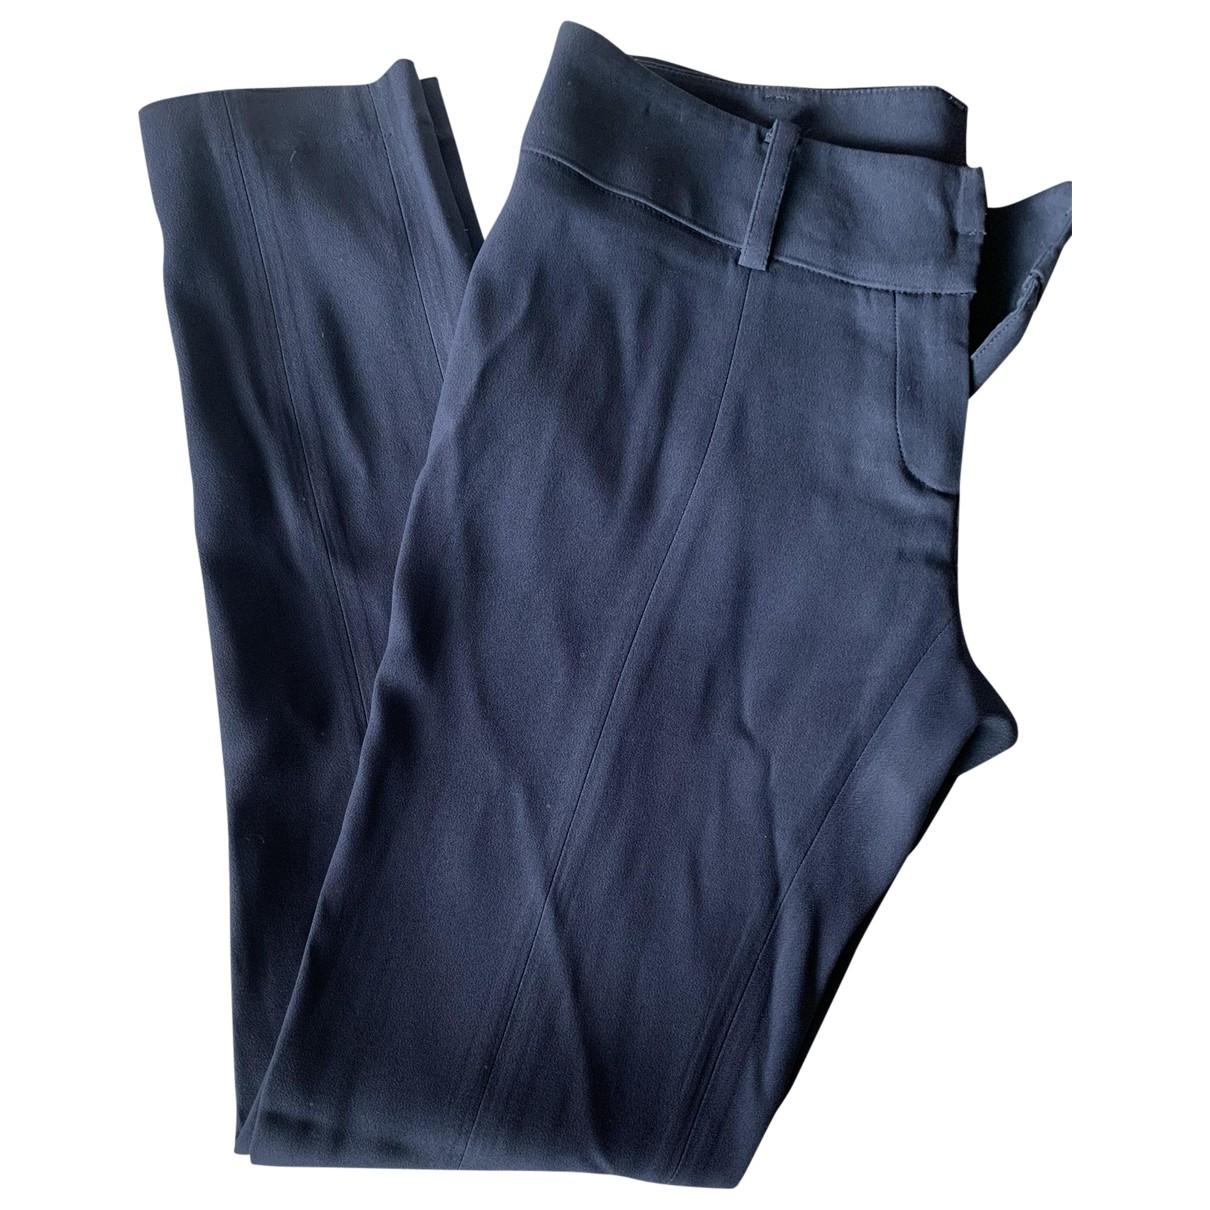 Patrizia Pepe \N Navy Trousers for Women 42 IT